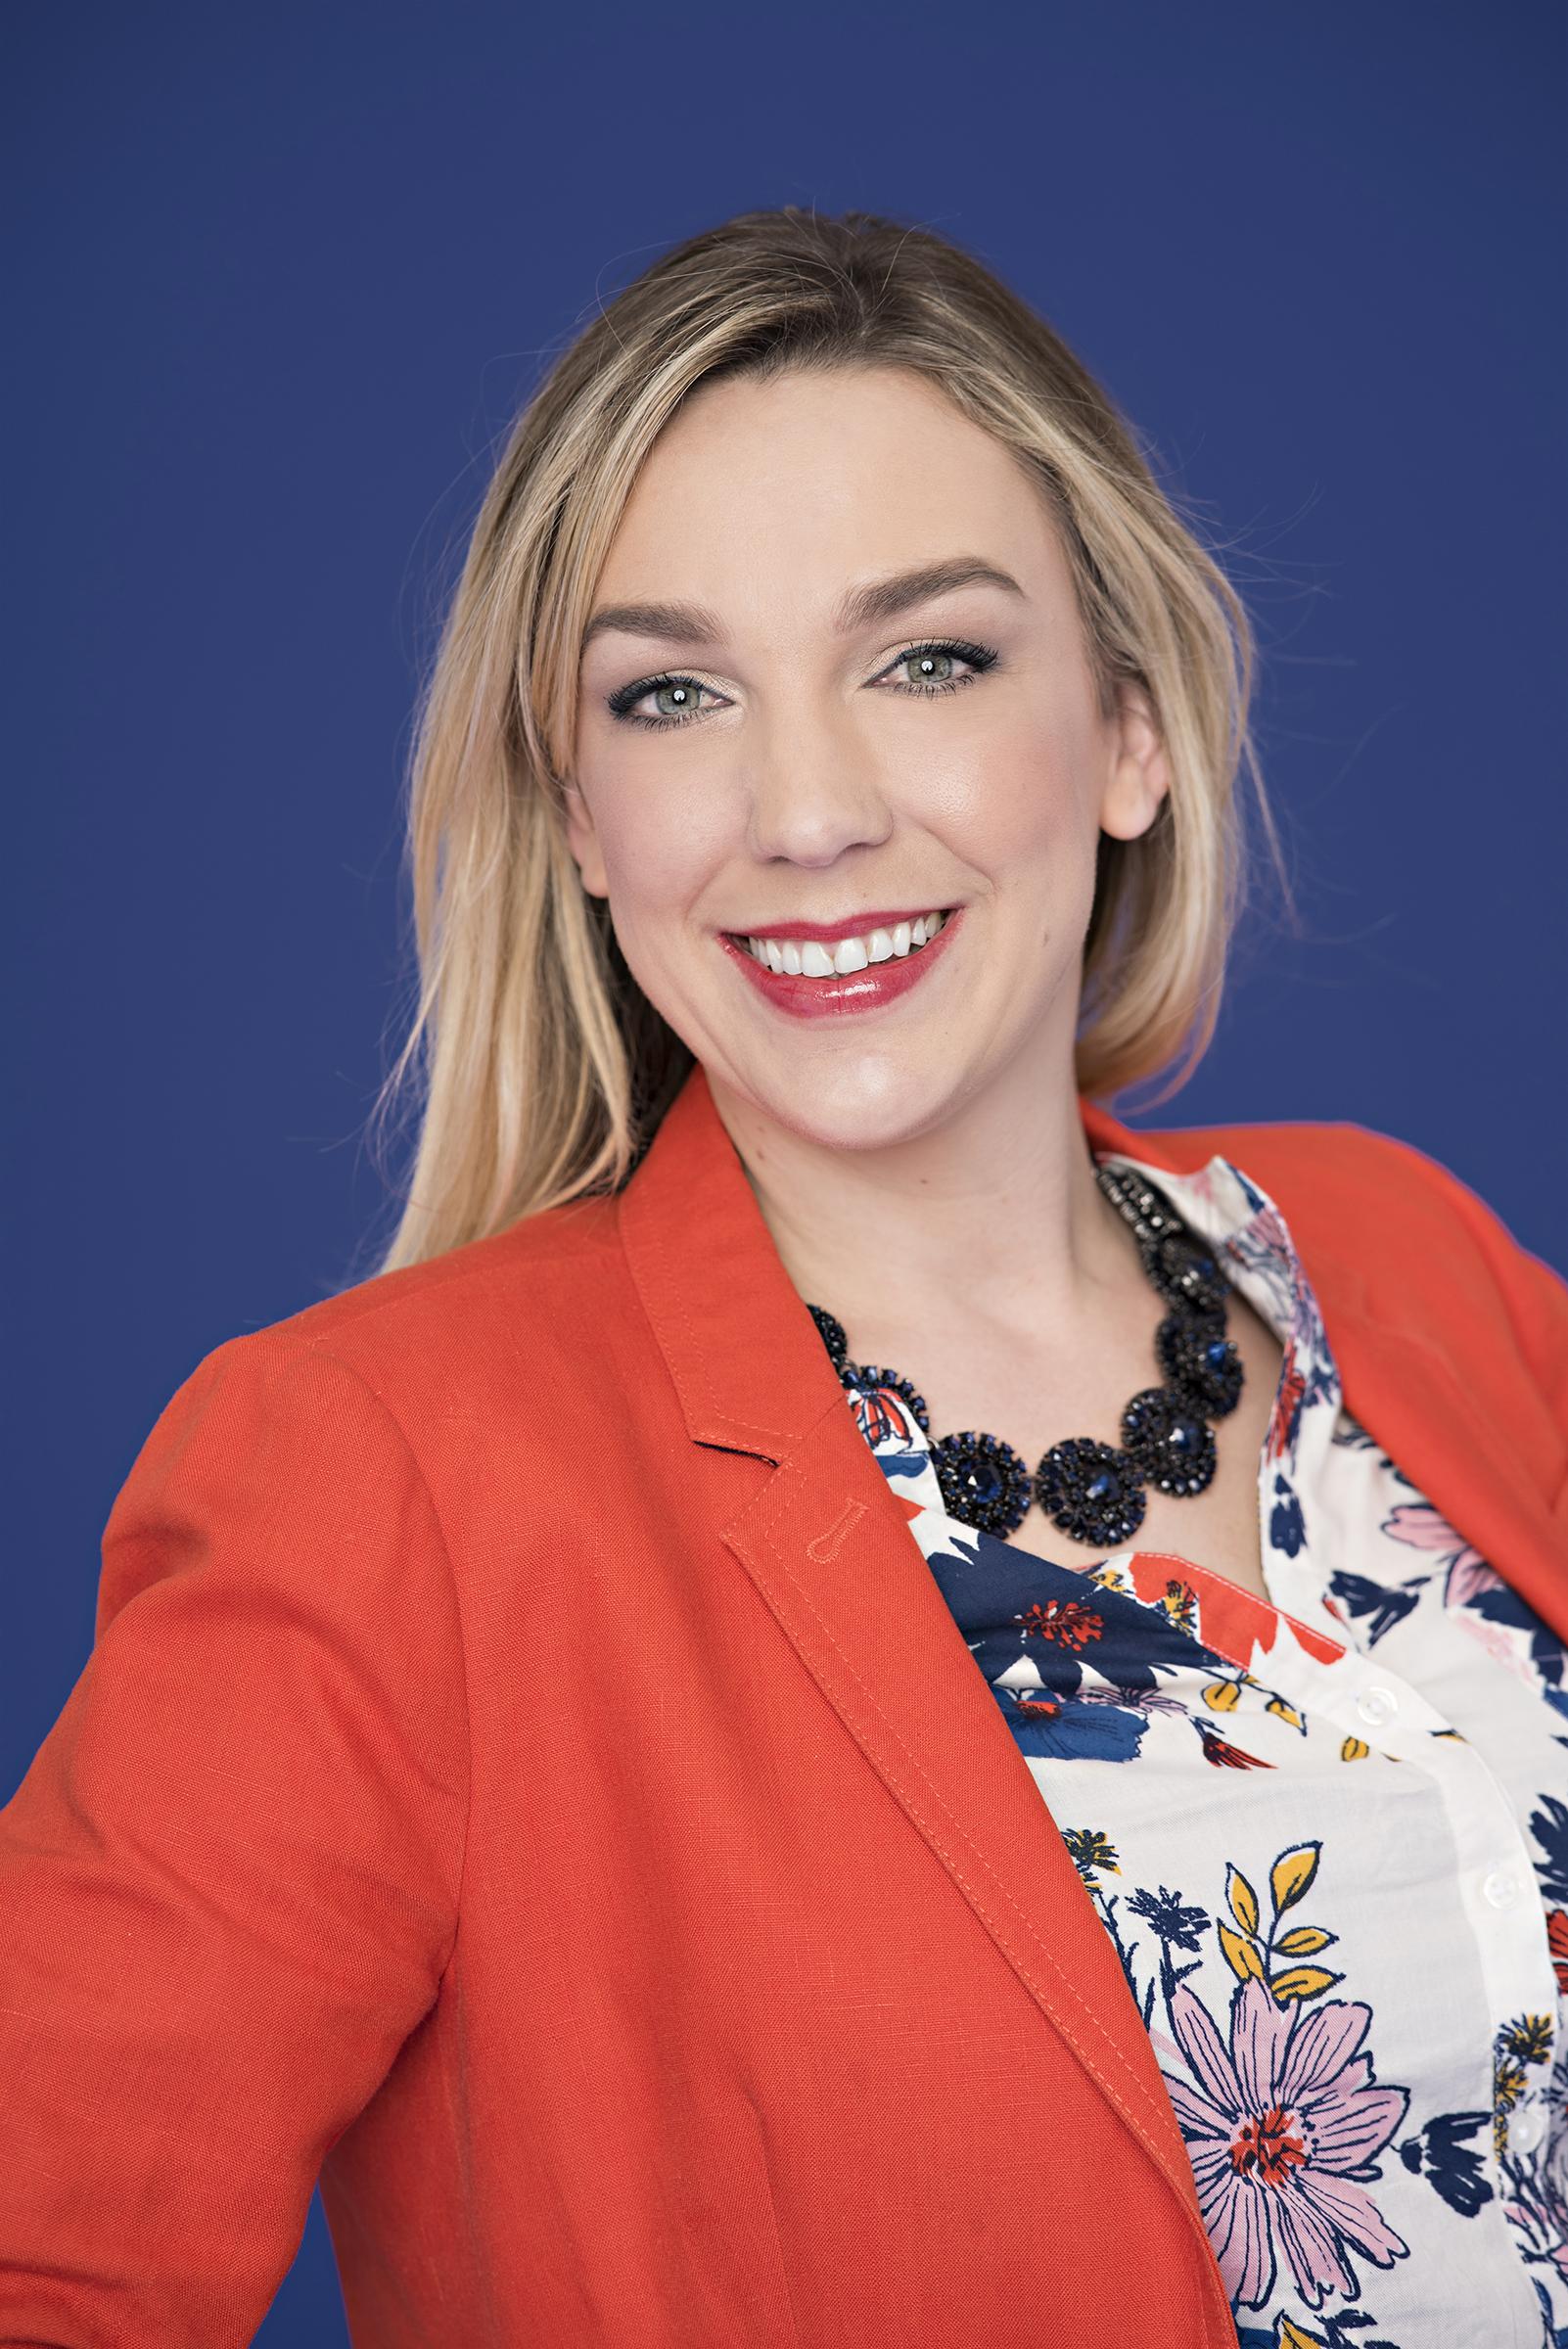 Macadamia Beauty Welcomes a New Global Innovation Director